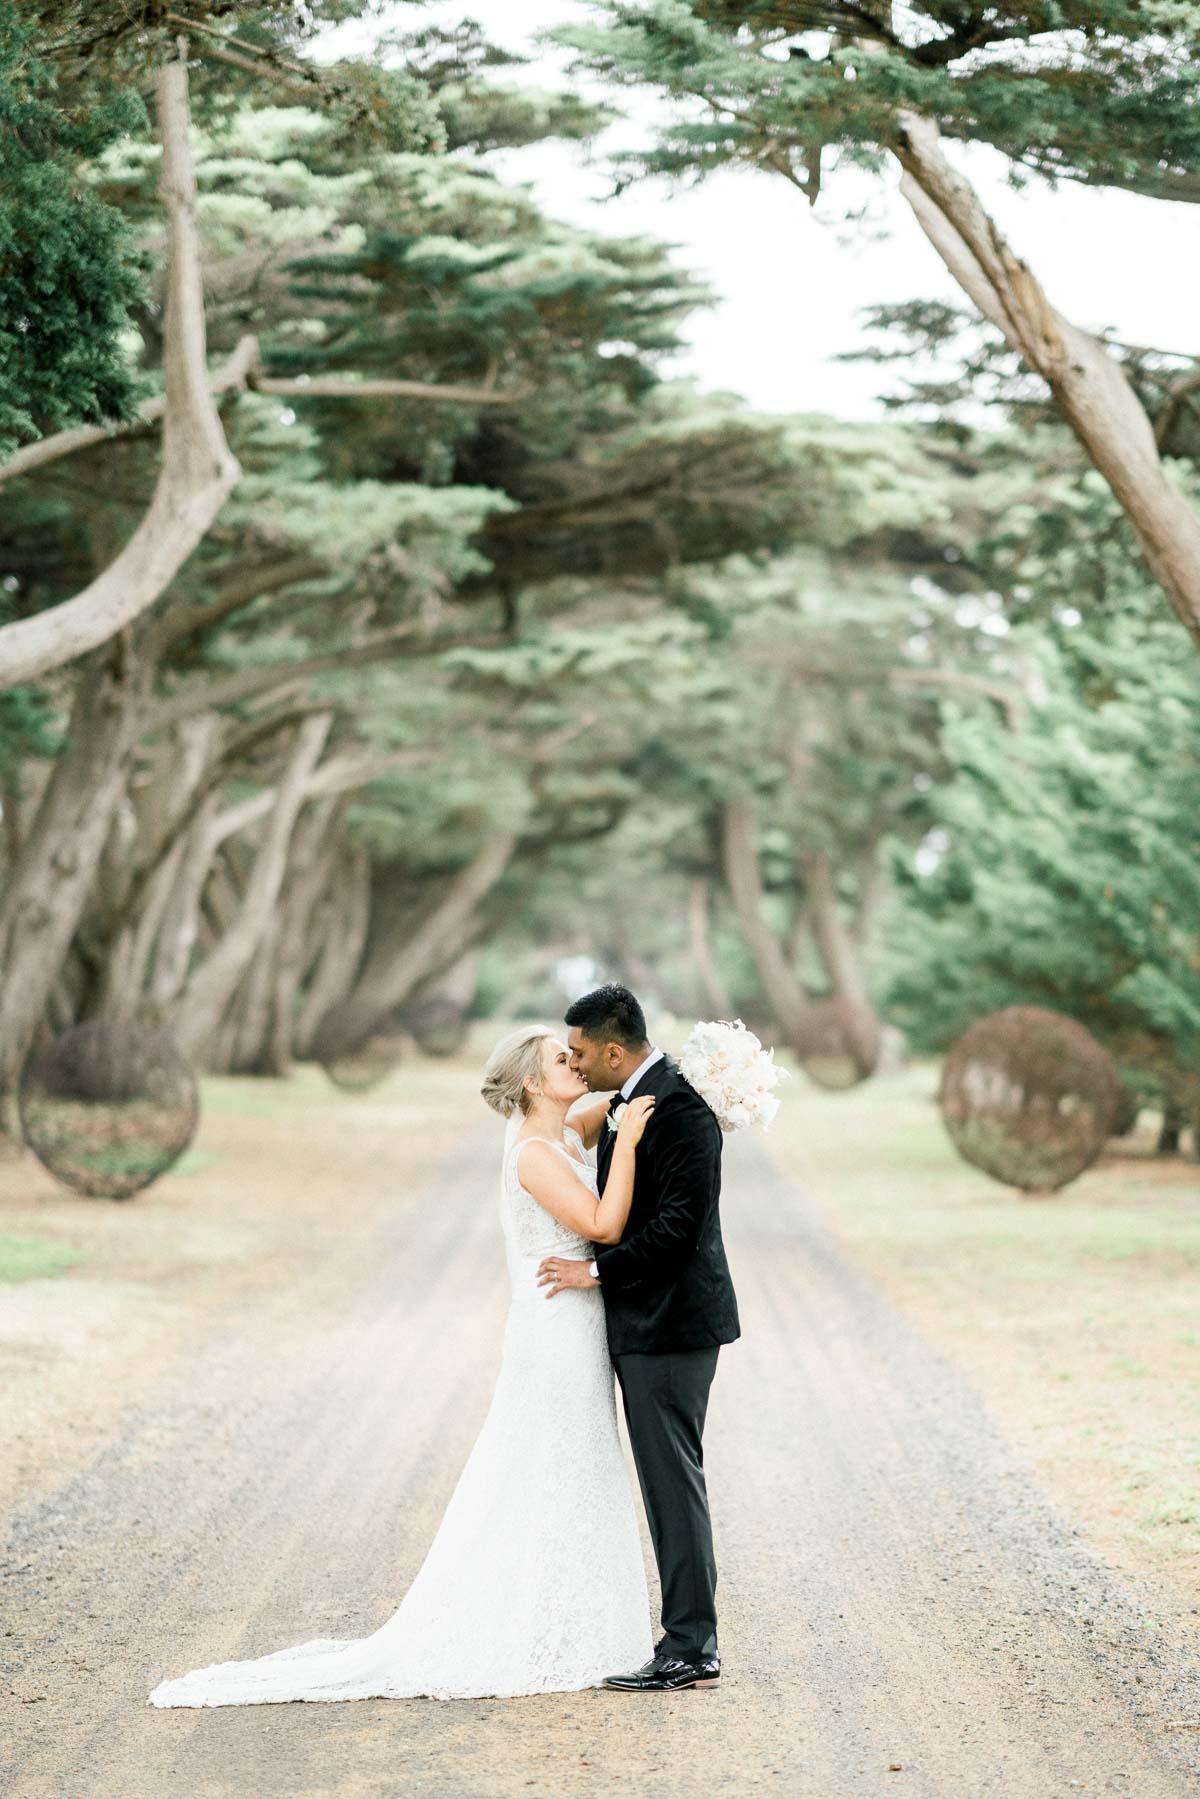 trenavin-chapel-phillip-island-wedding-heart+soul-weddings-sally-sean-01471.jpg